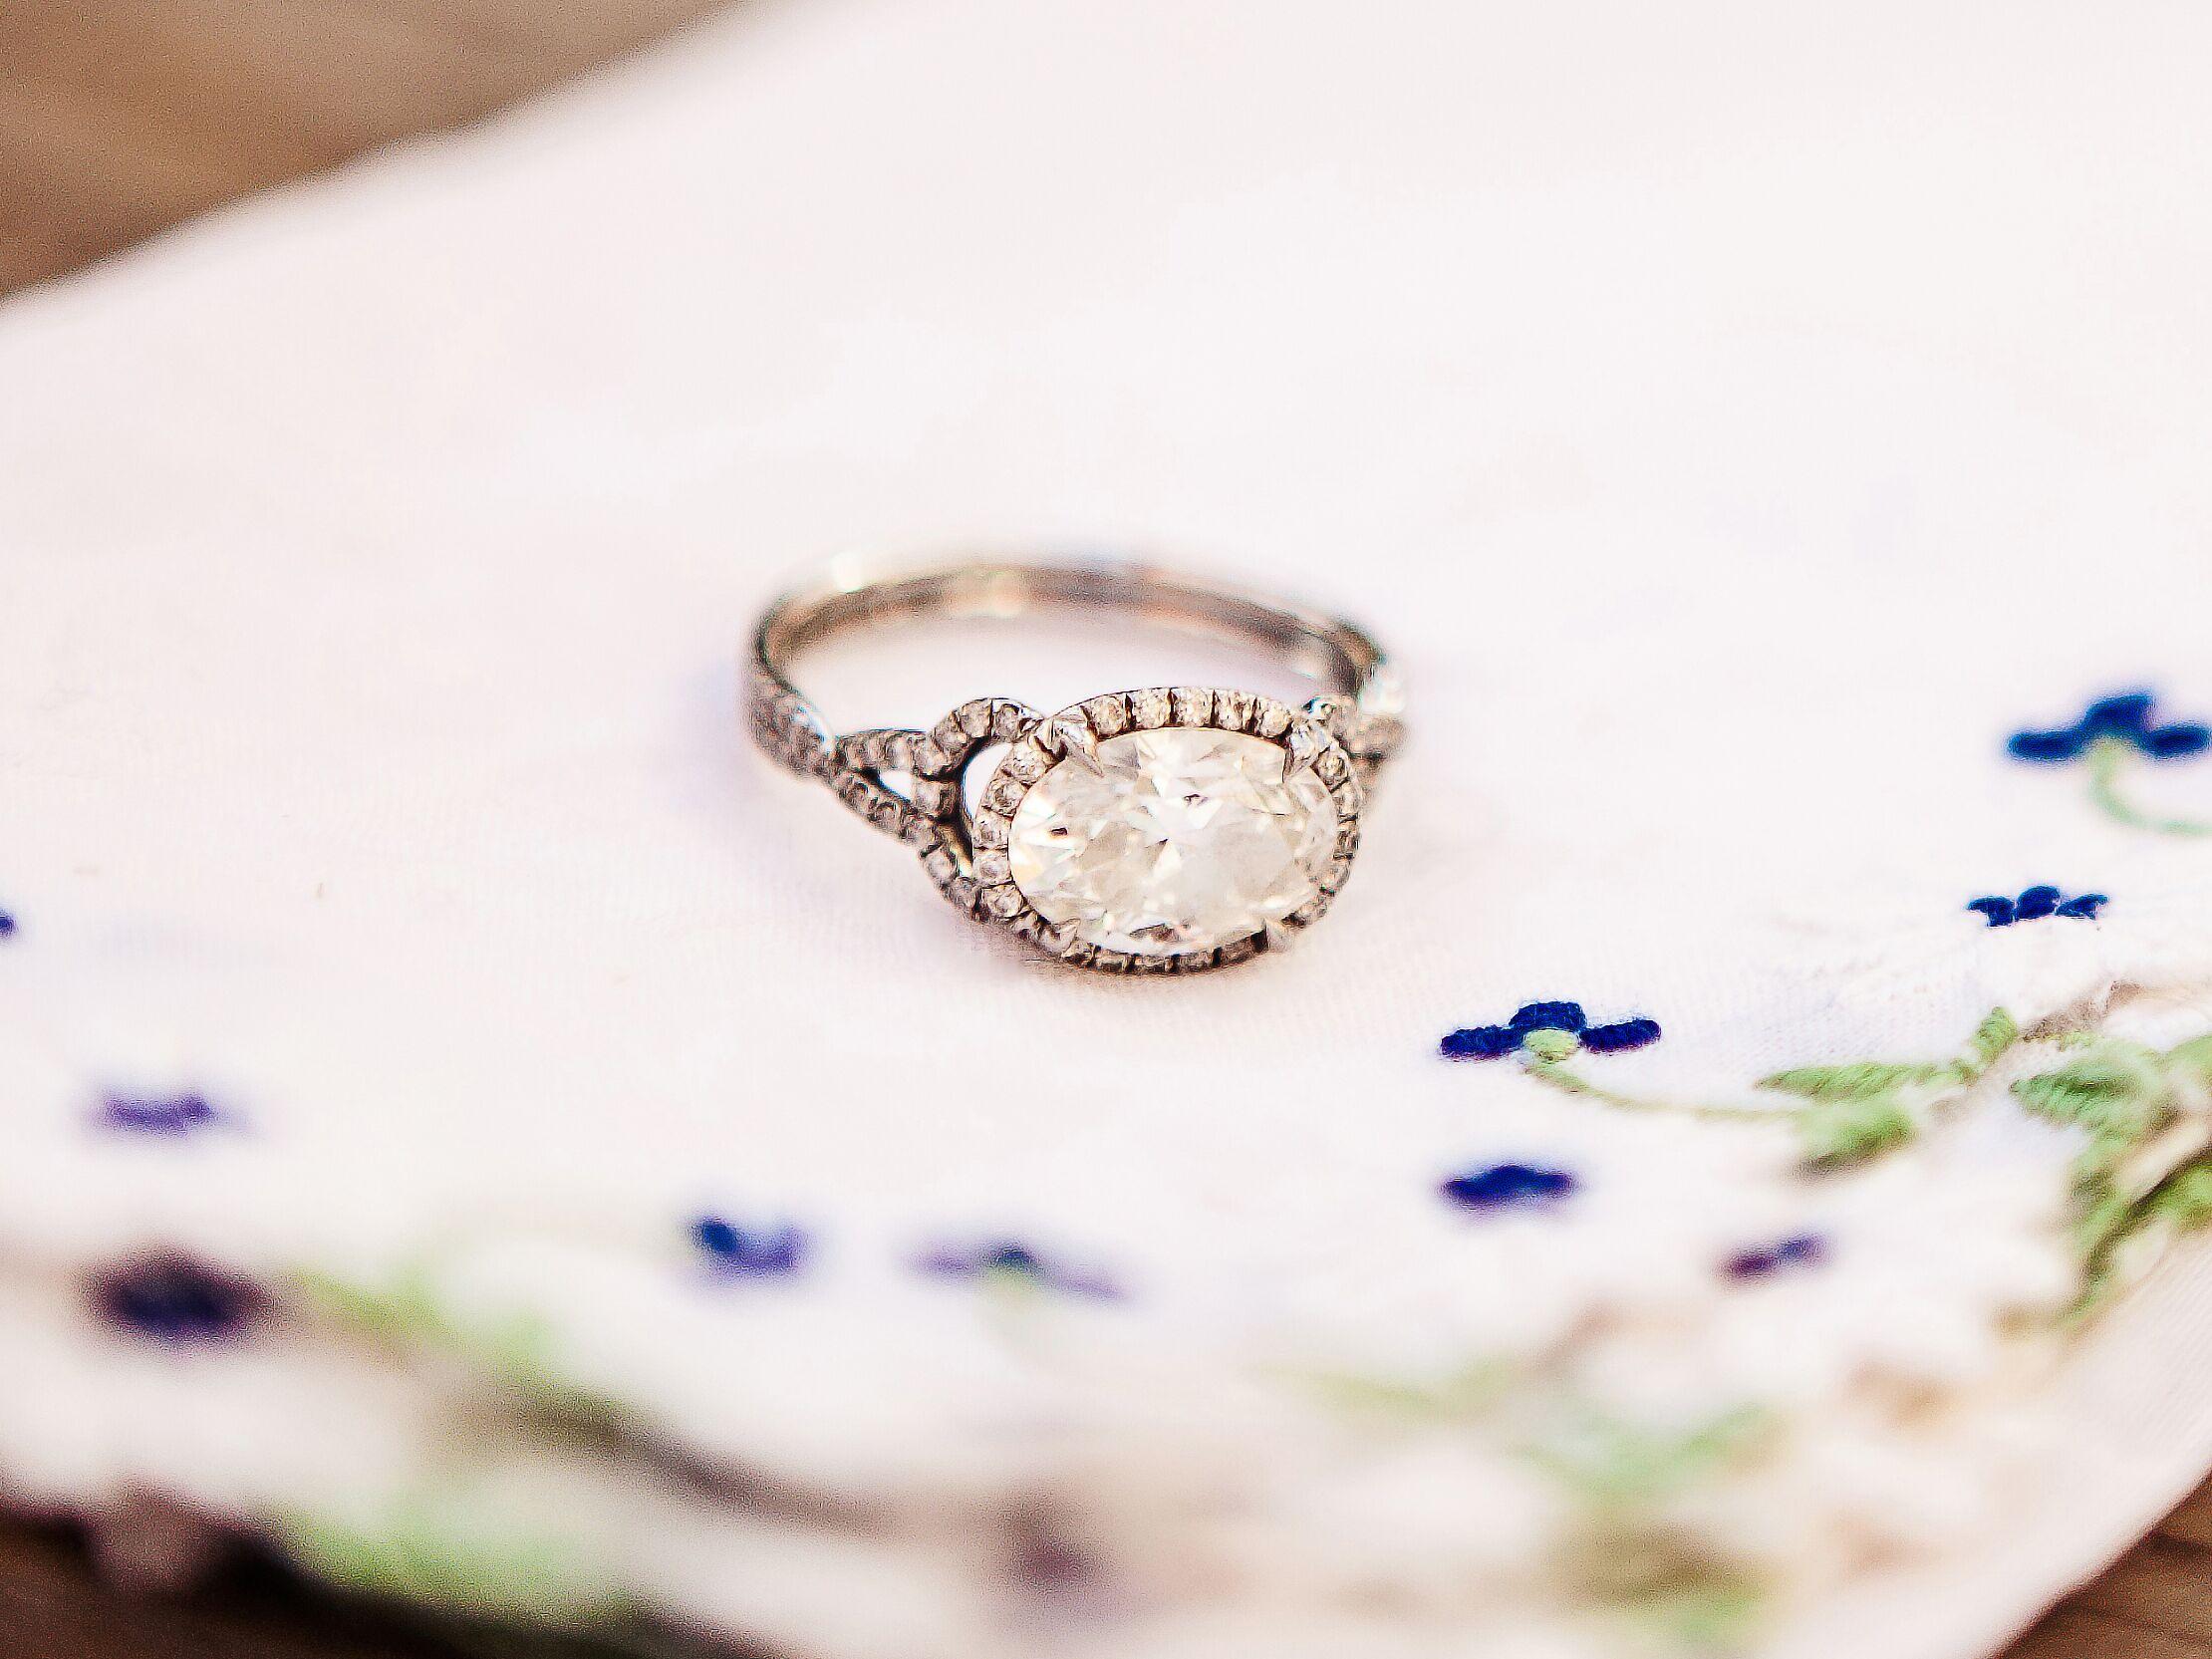 Diamonds & Gems: Resetting an Heirloom Stone